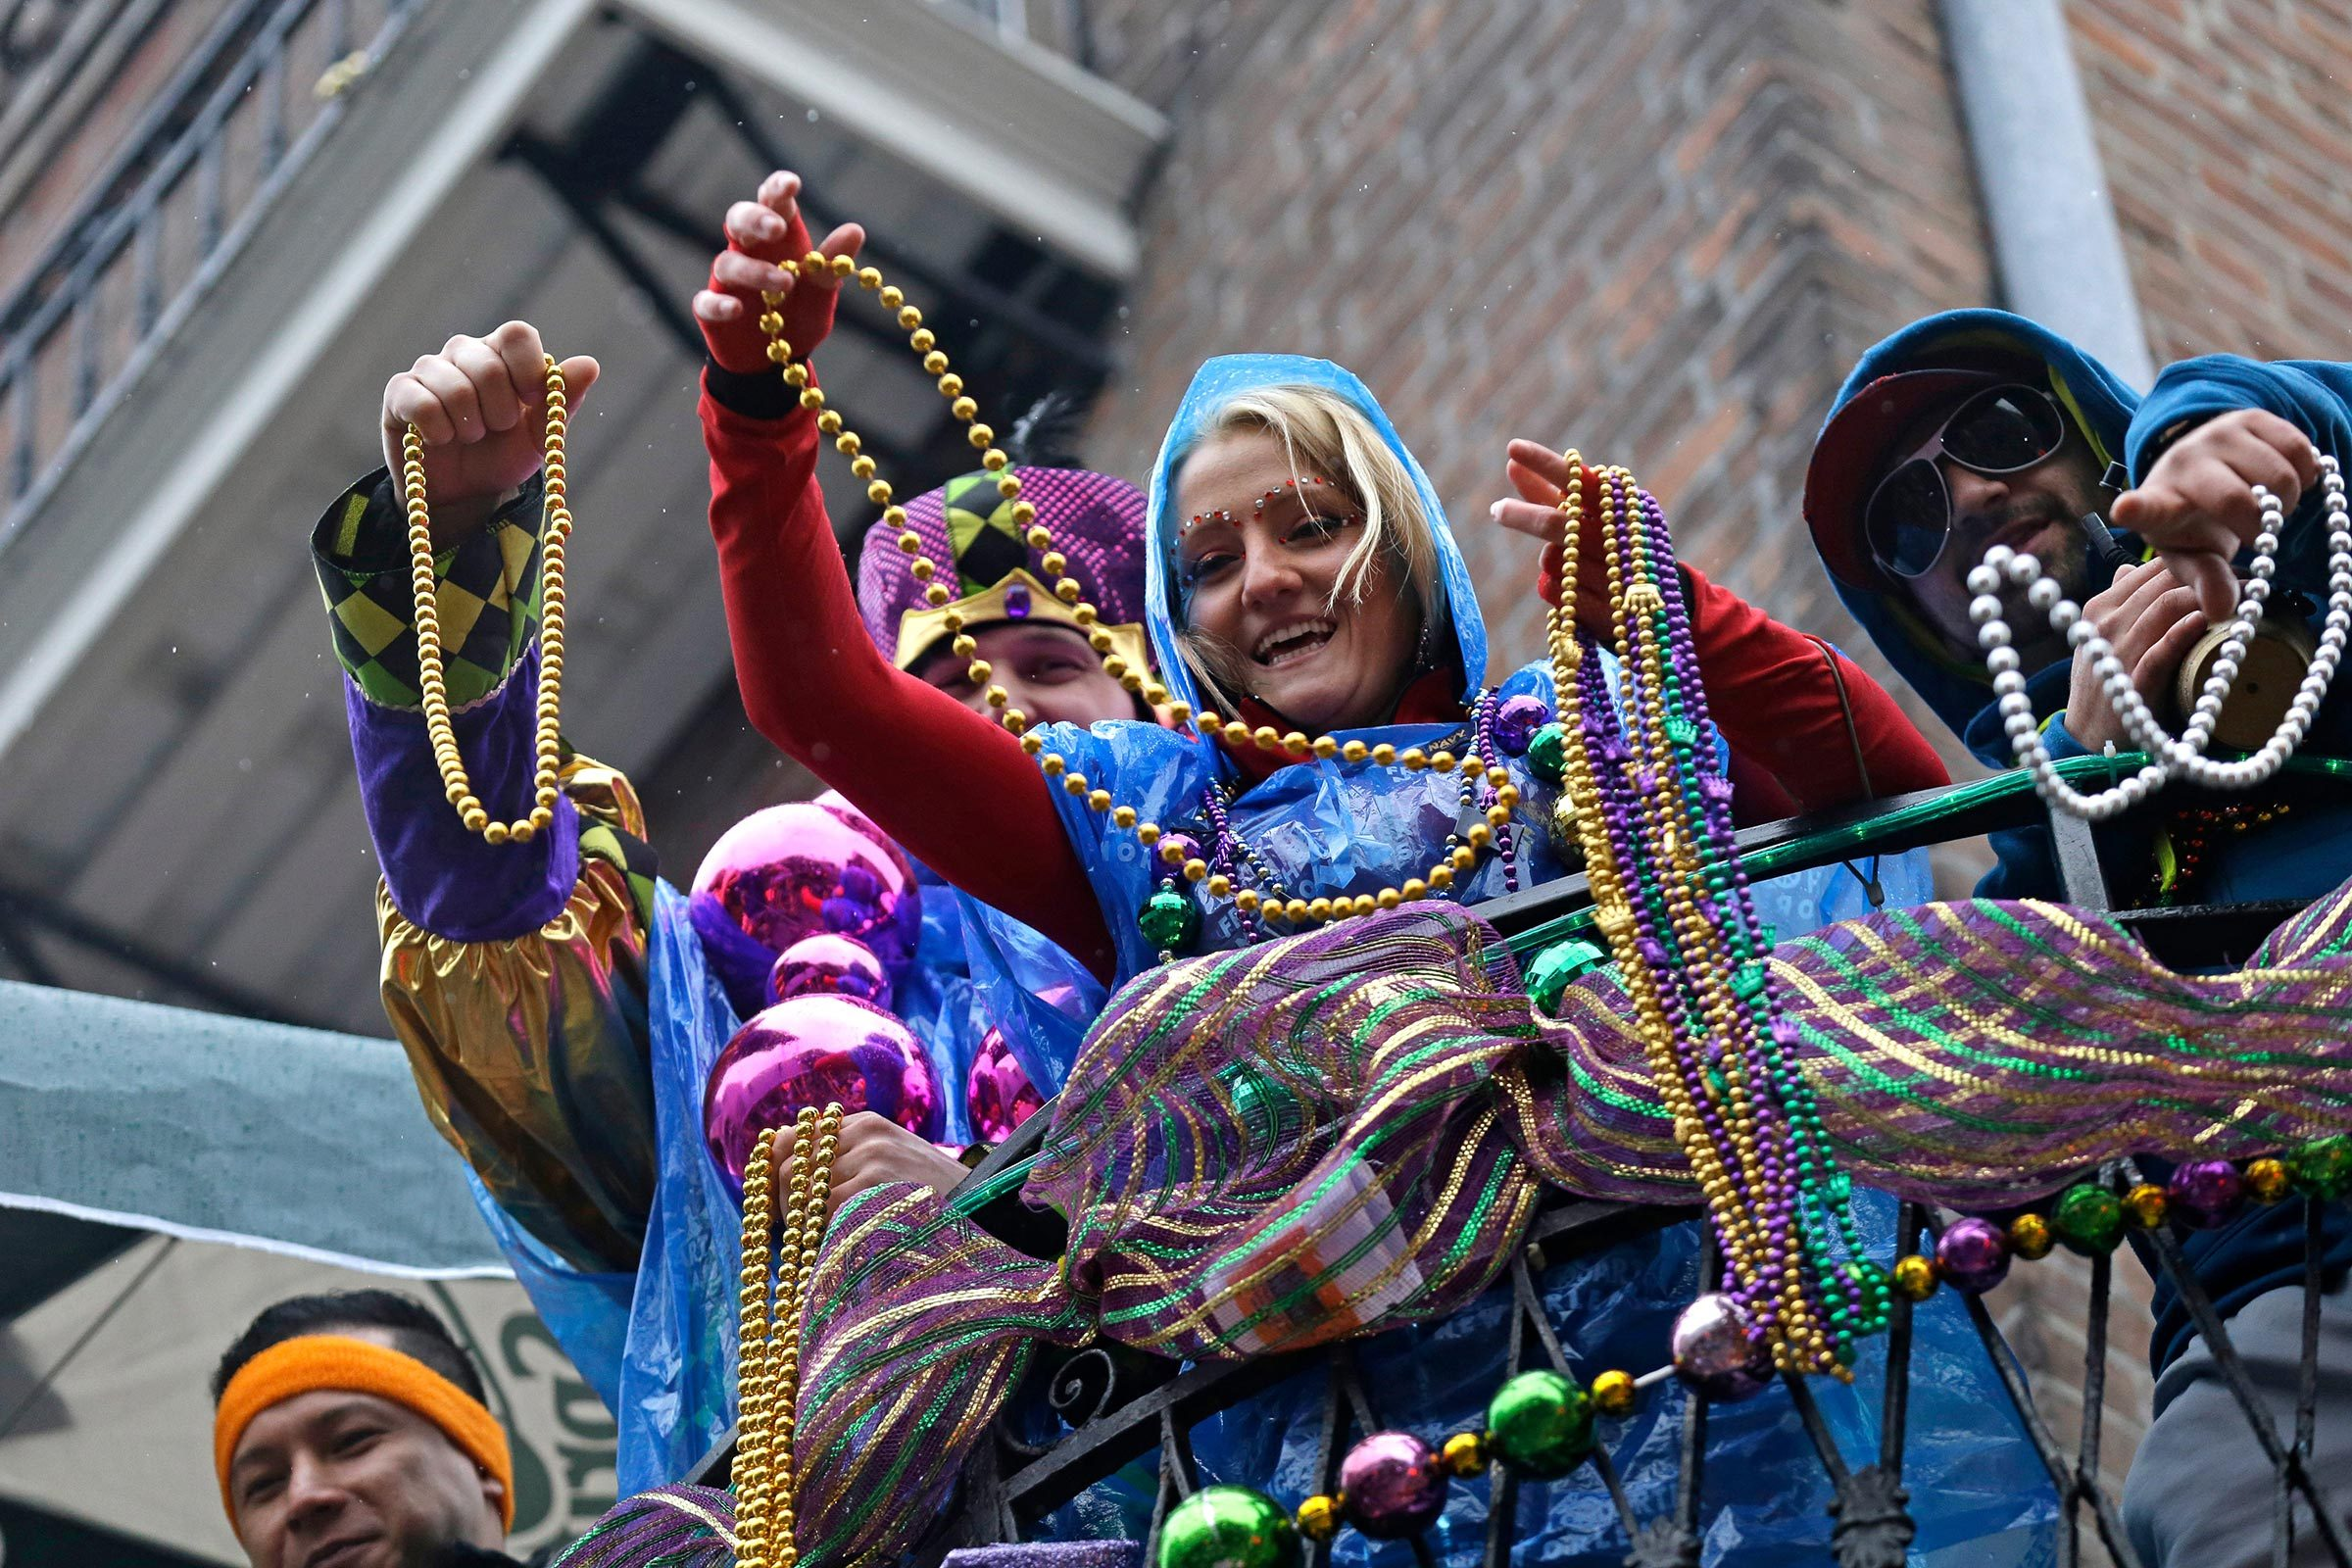 Mardi Gras, New Orleans, USA